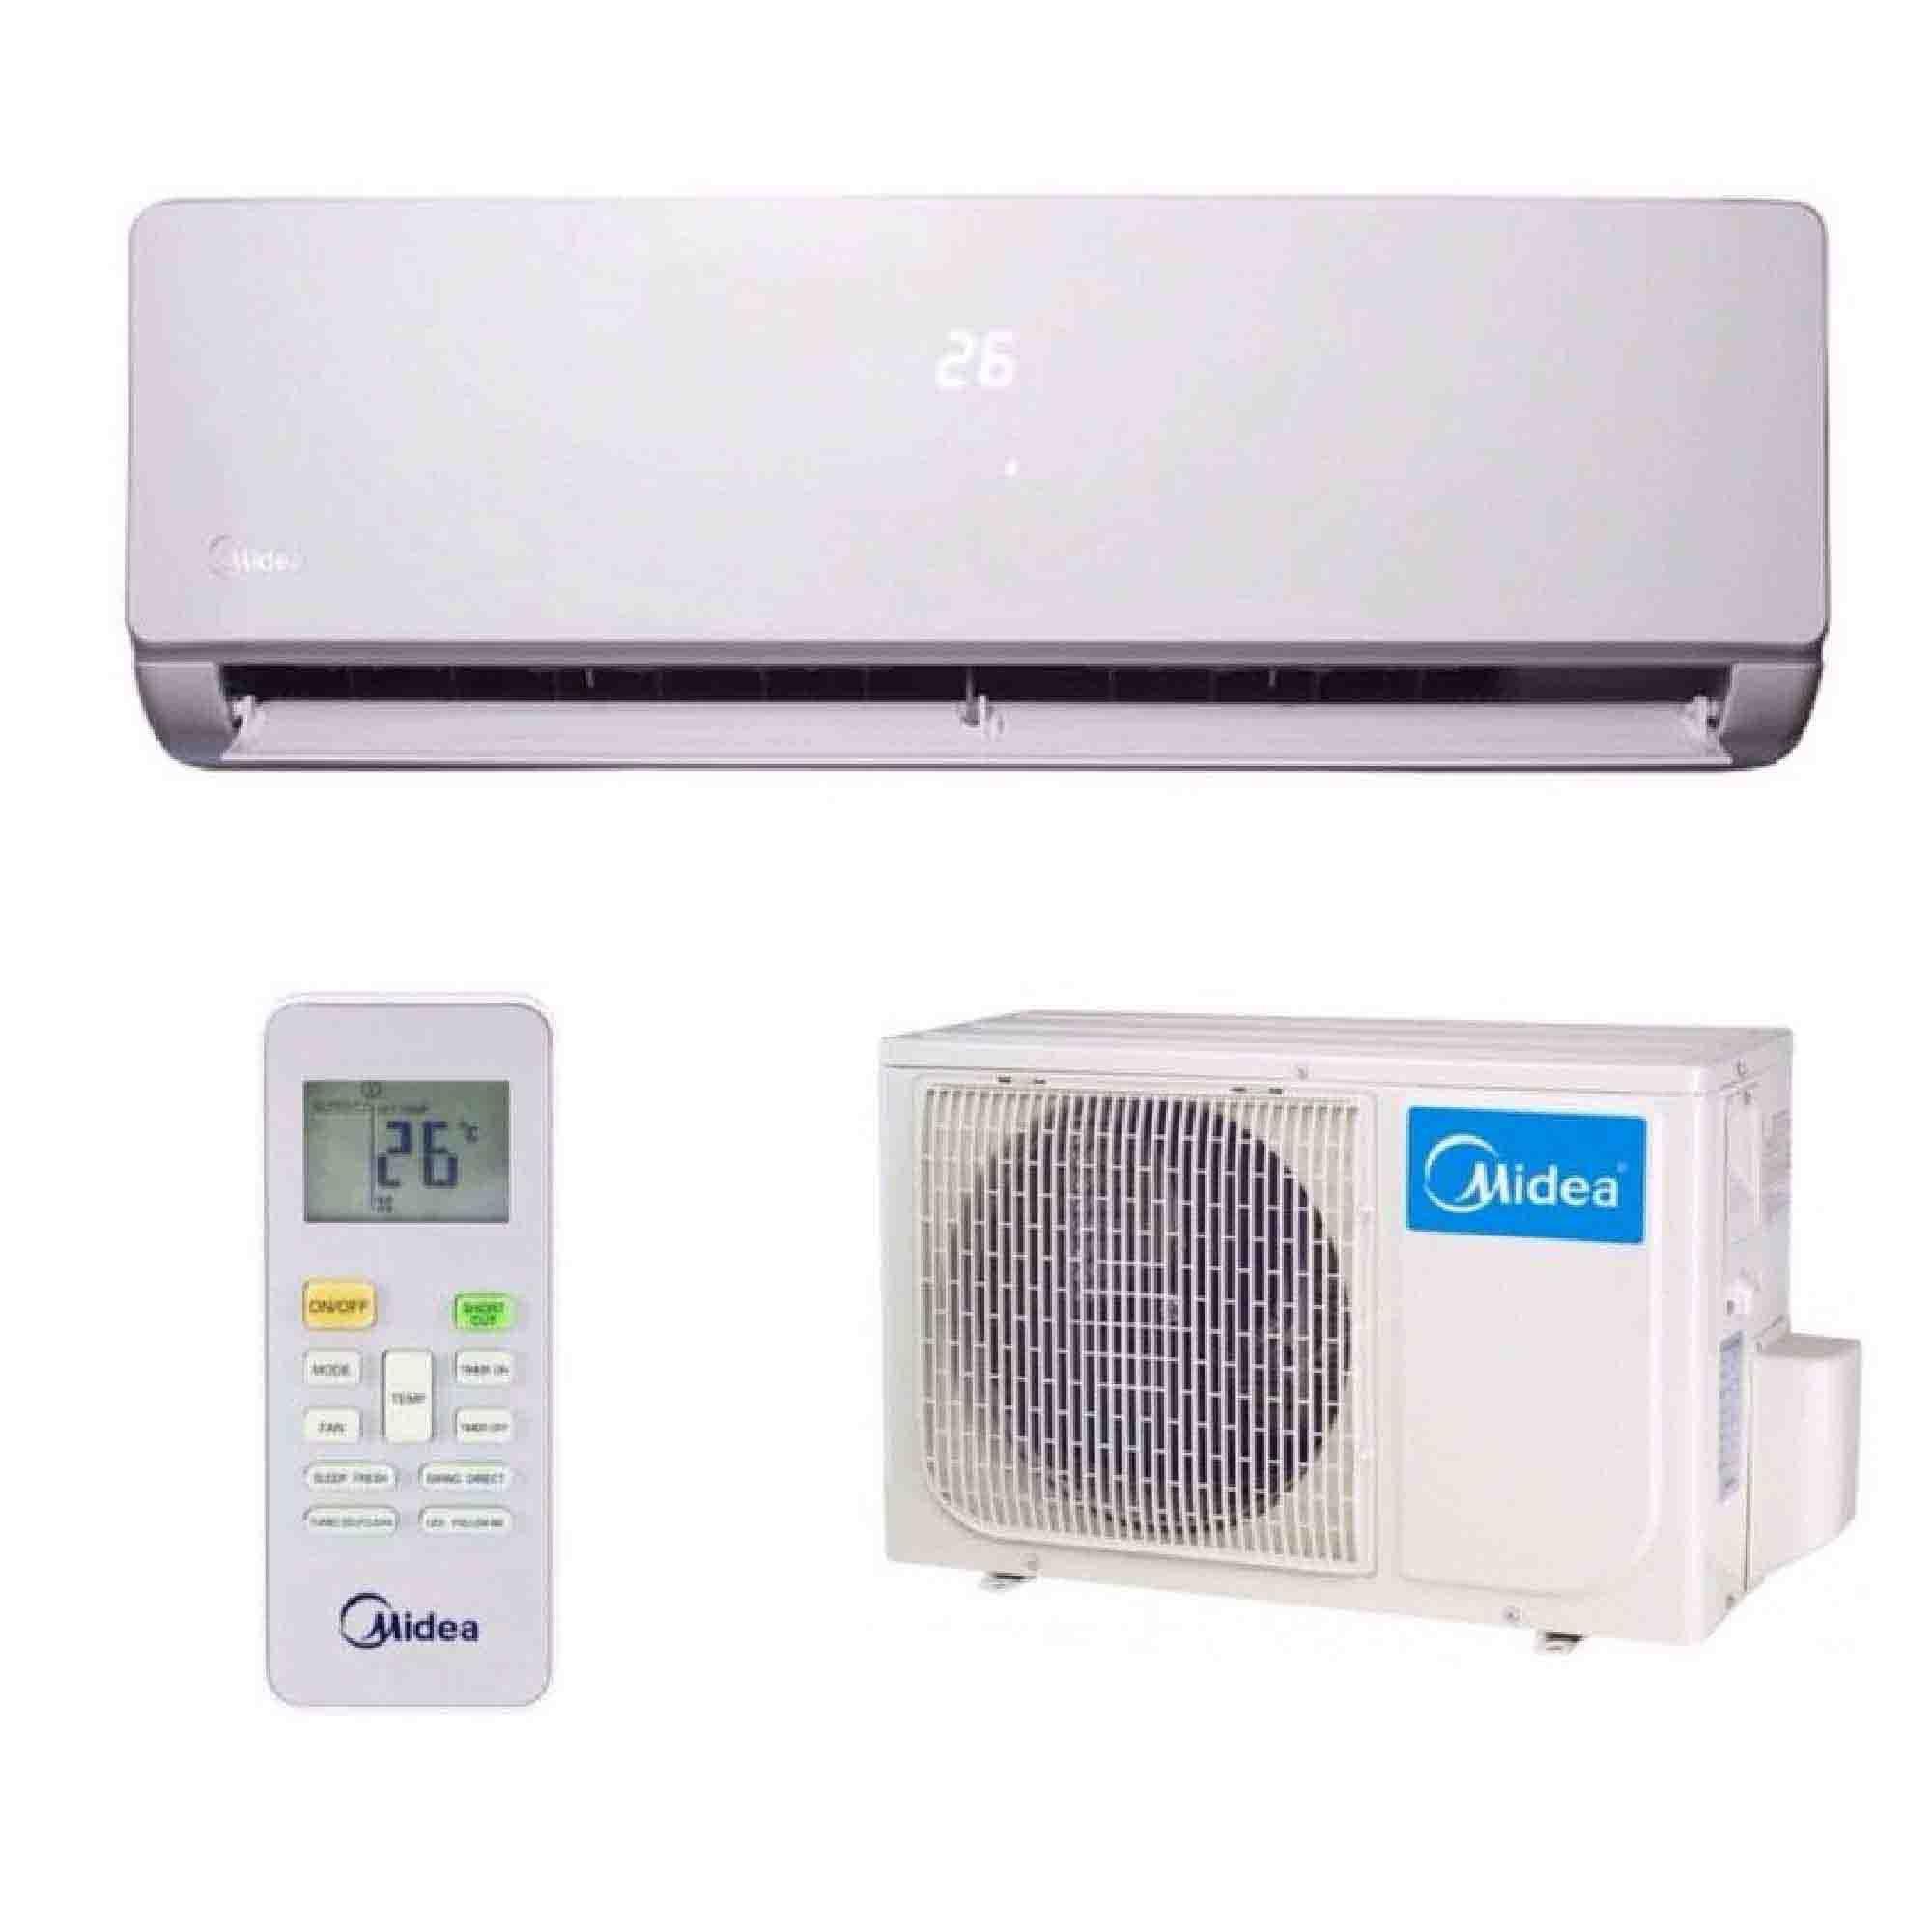 midea air conditioner msk3 09crn1 end 1 22 2021 12 00 am rh lelong com my midea portable air conditioner user manual midea portable air conditioner user manual